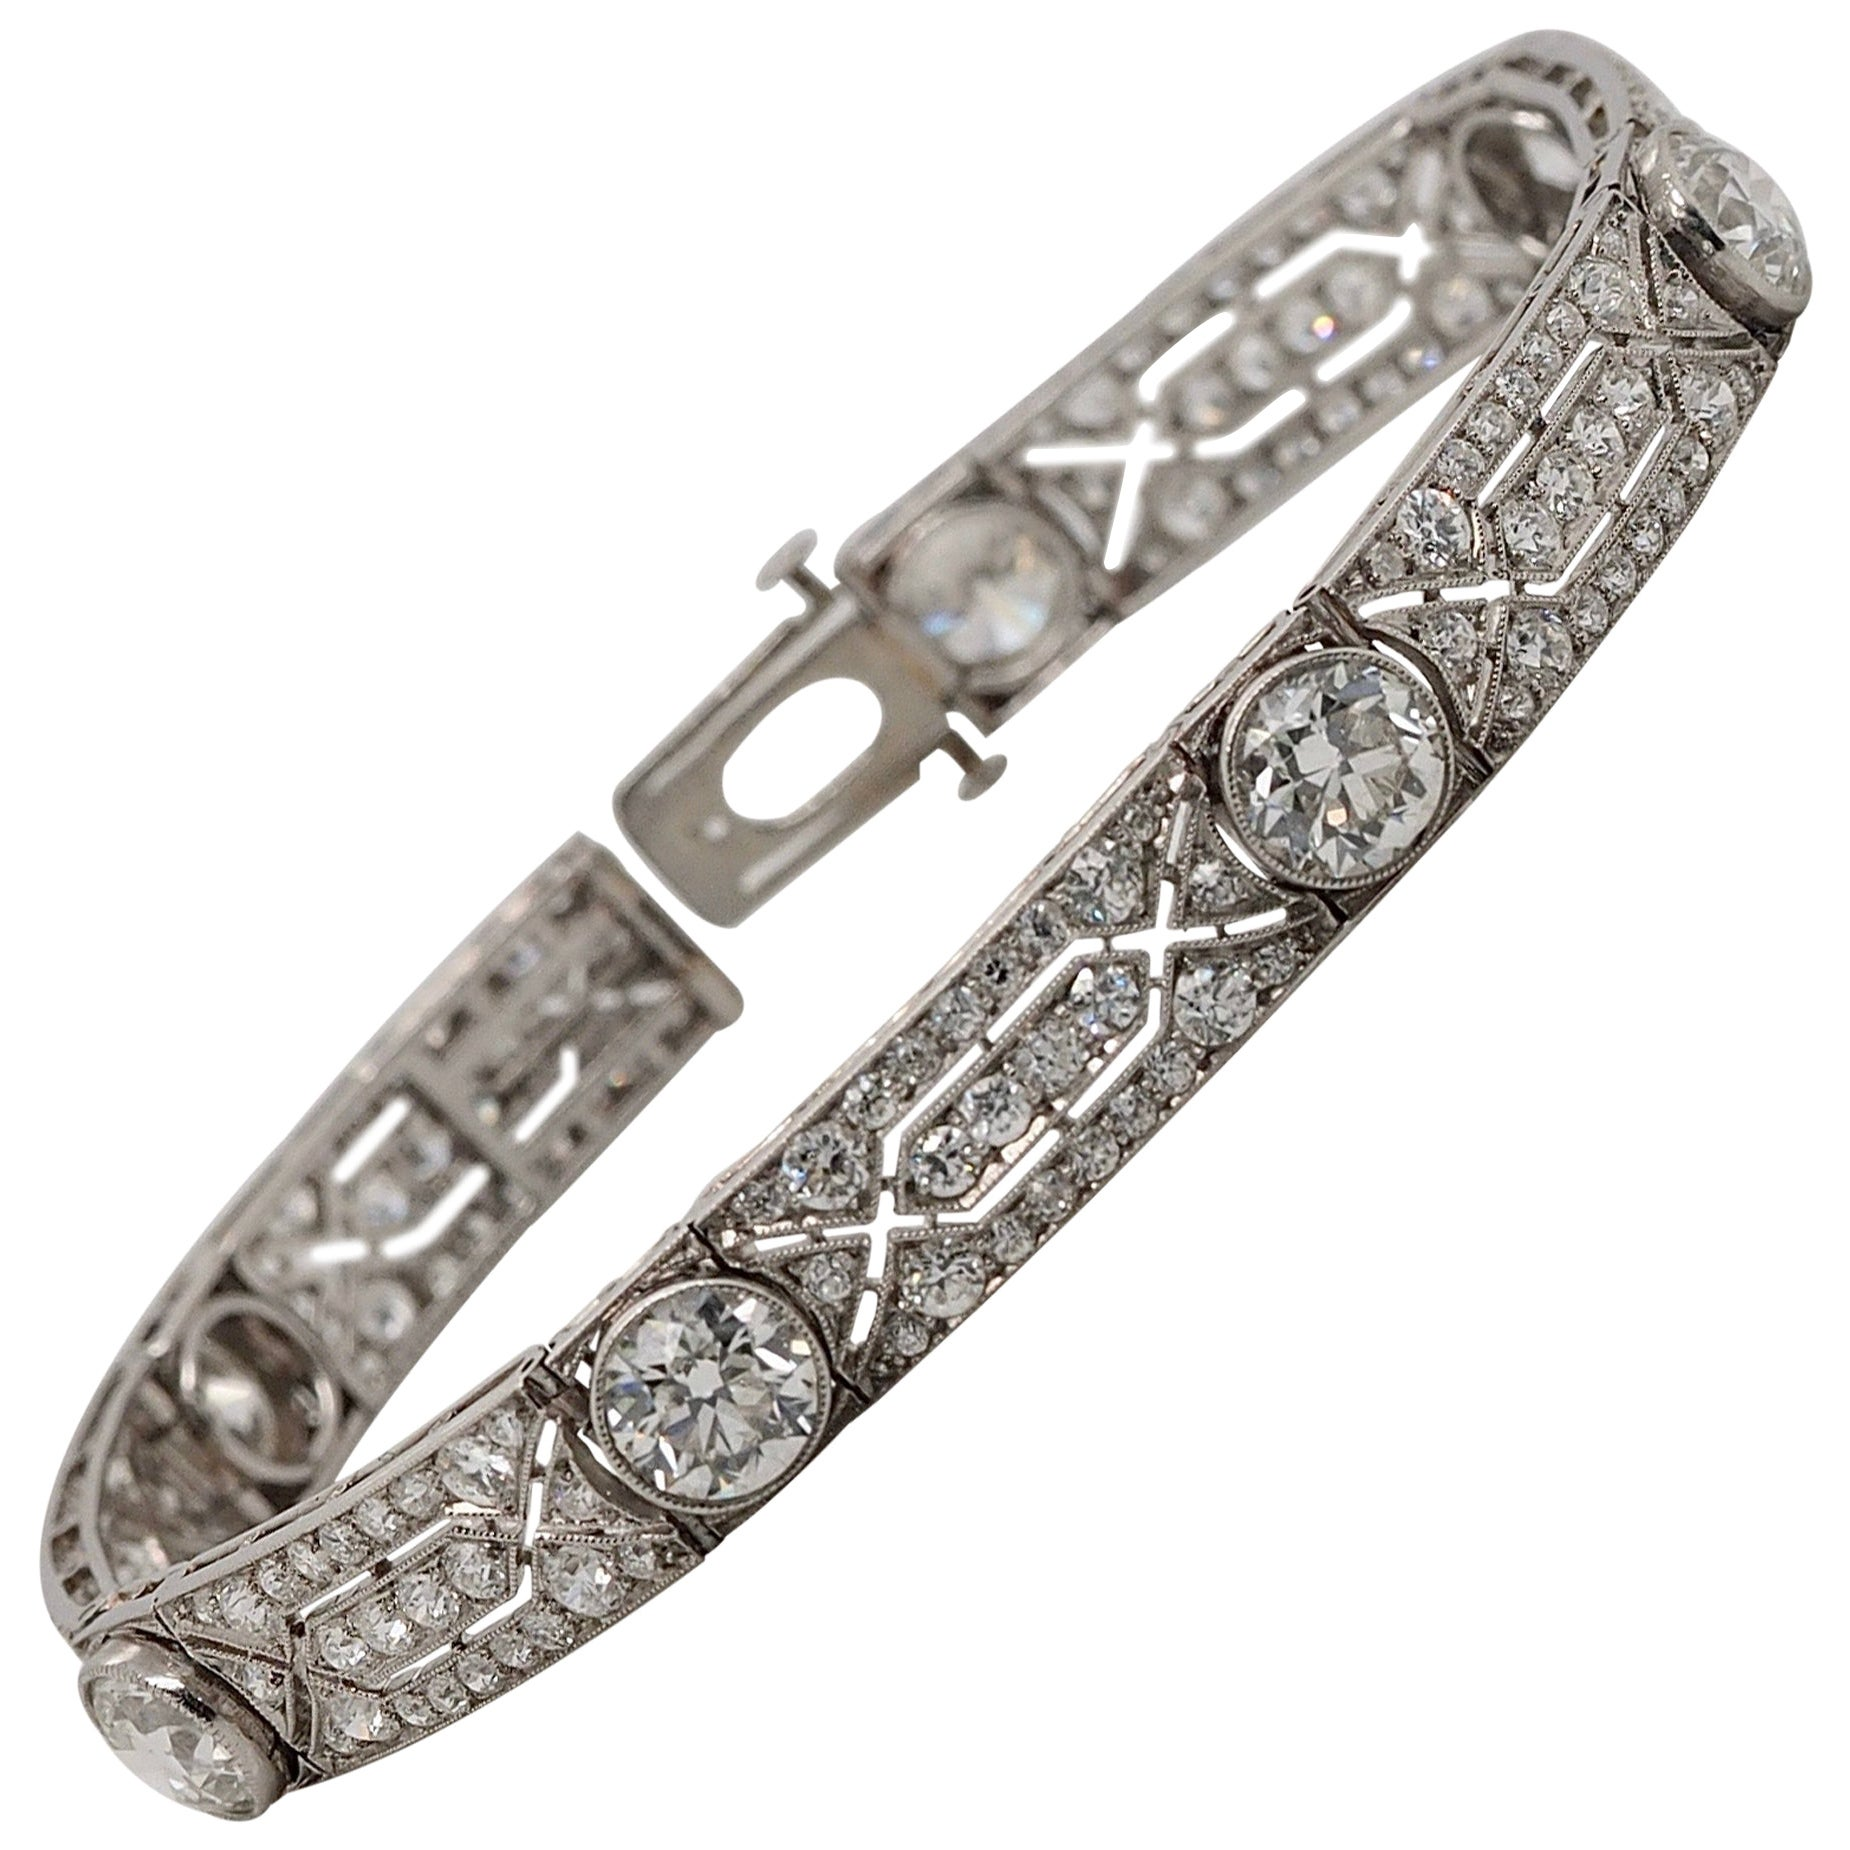 Vintage Tiffany & Co. Diamond Platinum Deco Bracelet, circa 1915